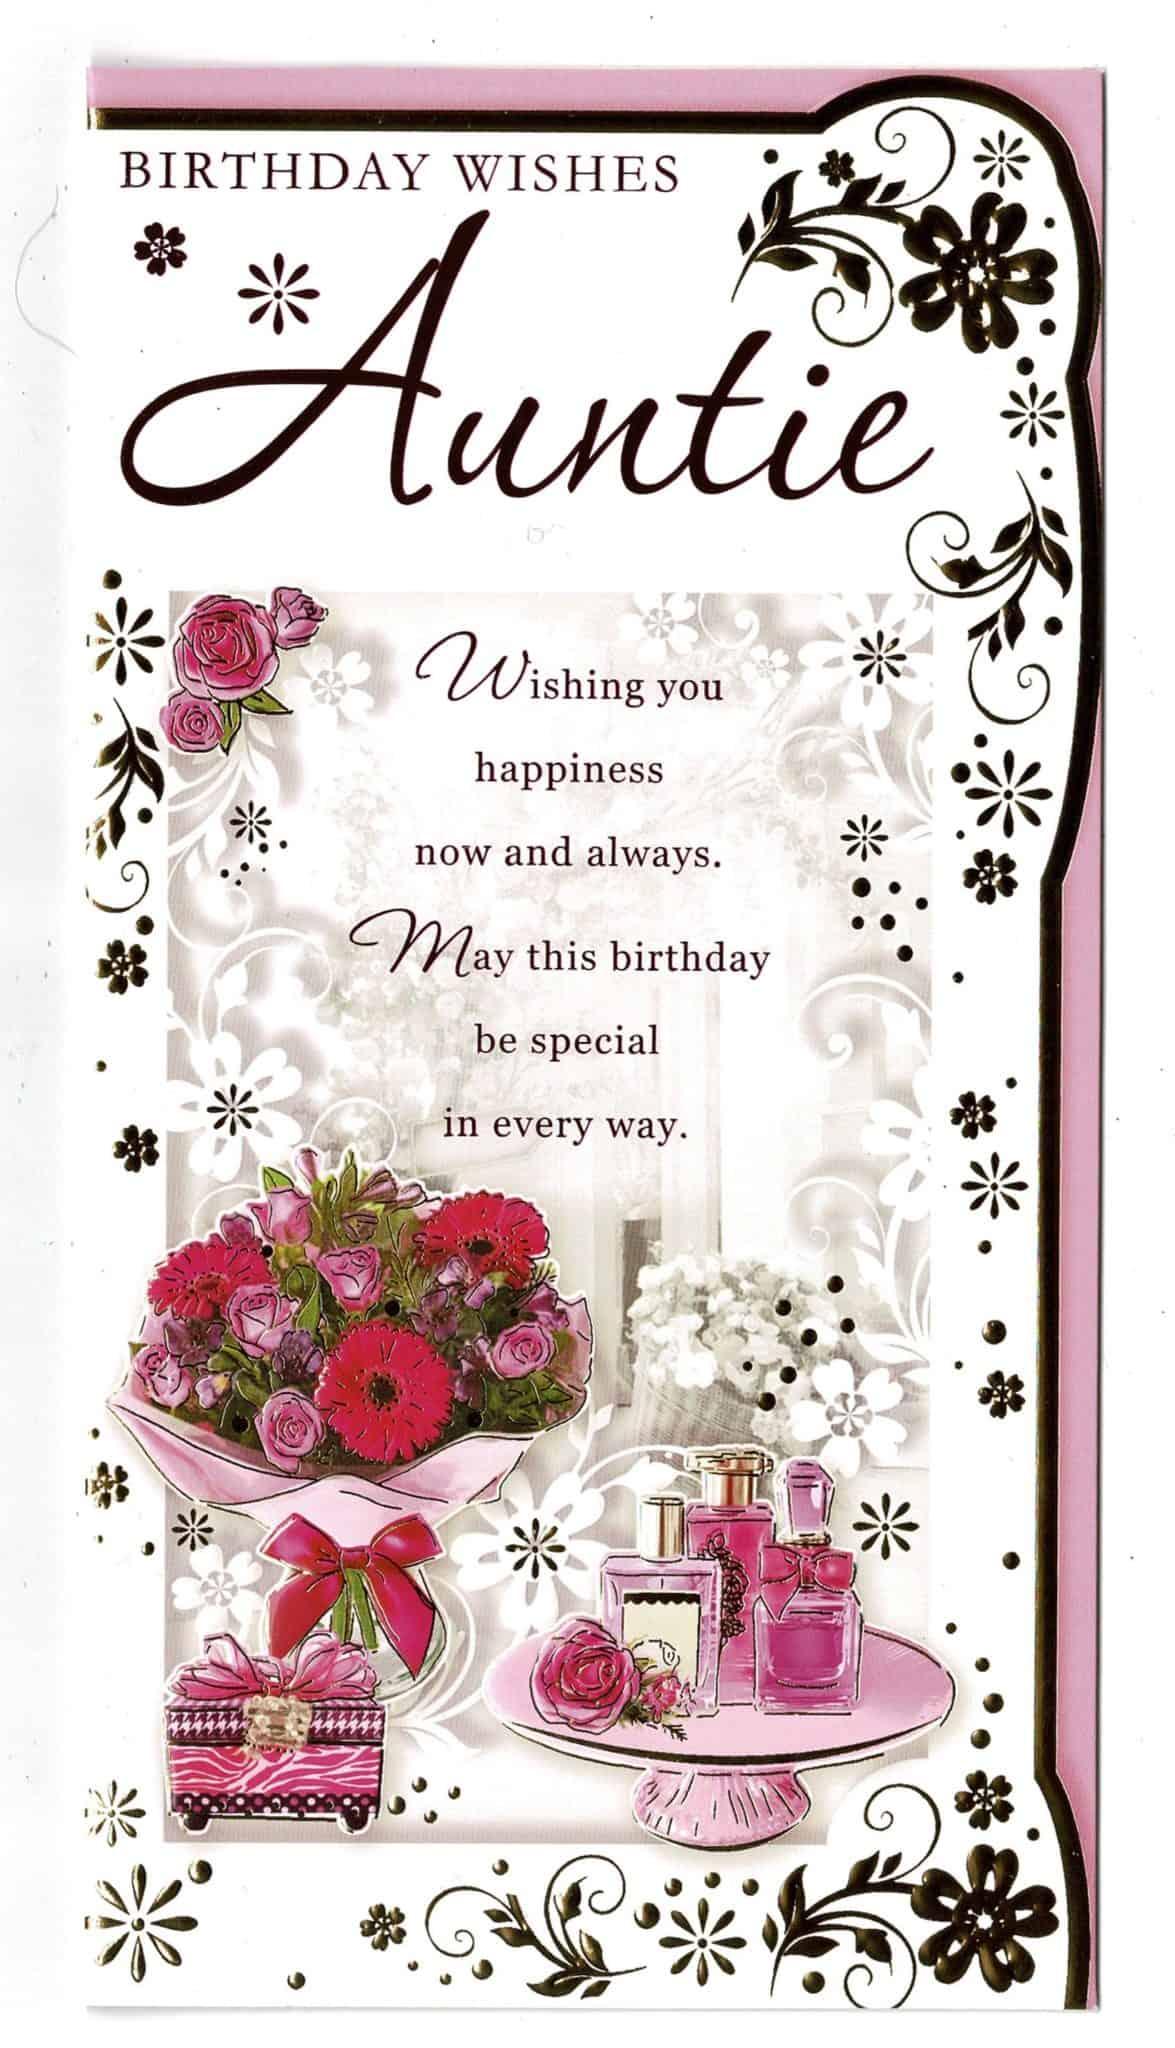 auntie birthday card with sentiment verse 'birthday wishes